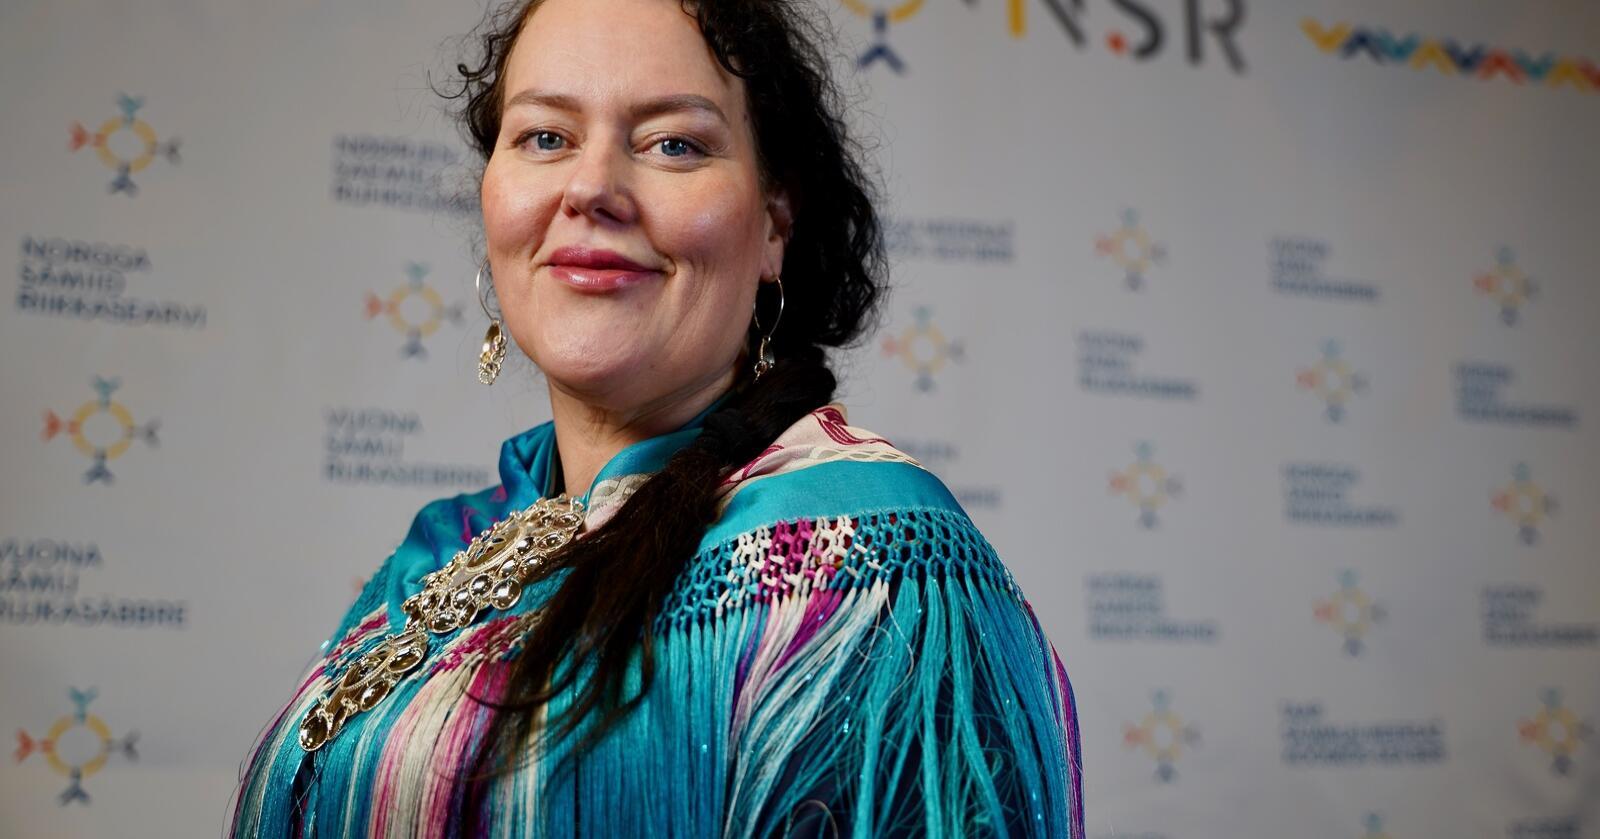 Trenger folk: Silje Karine Muotka er NSRs presidentkandidat. Foto: NSR